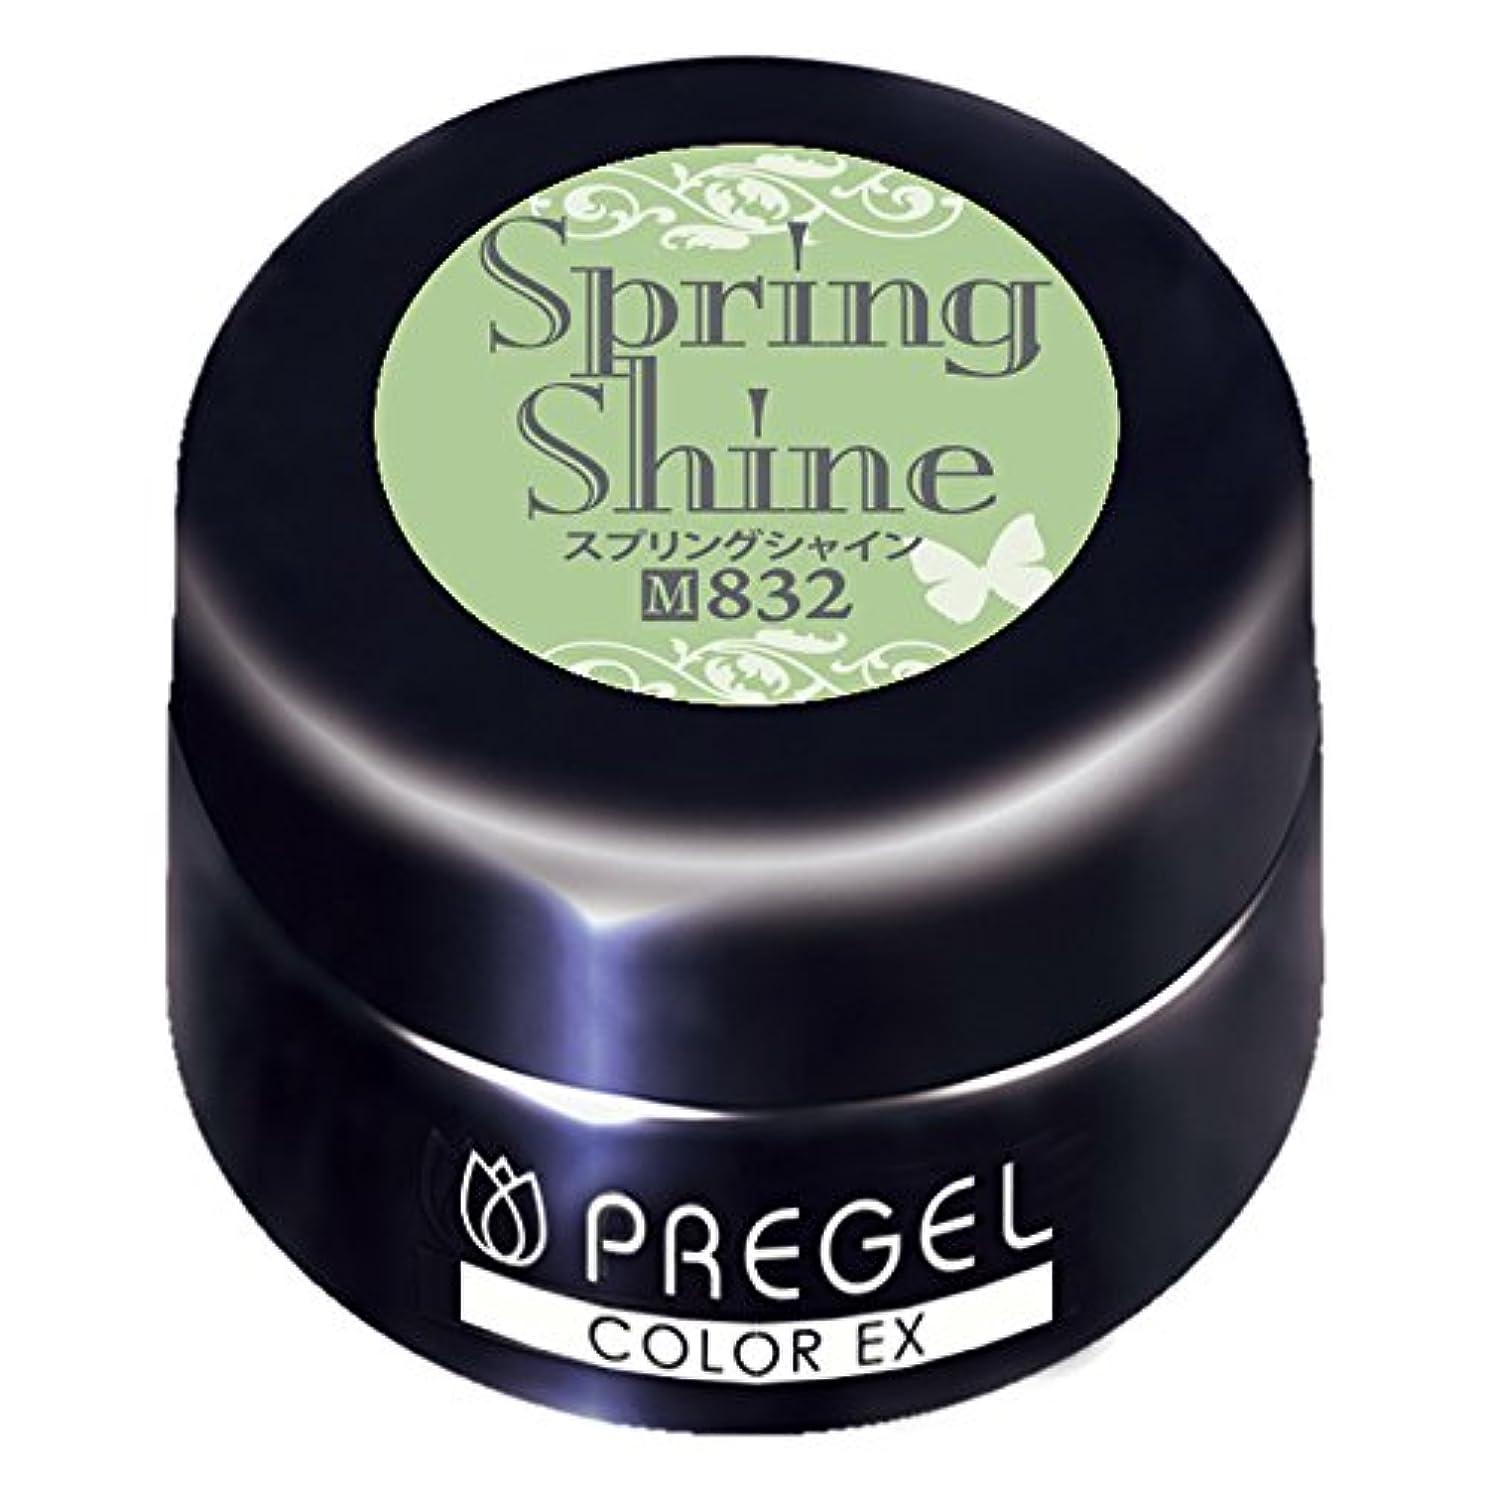 PRE GEL カラーEX スプリングシャイン832 3g UV/LED対応